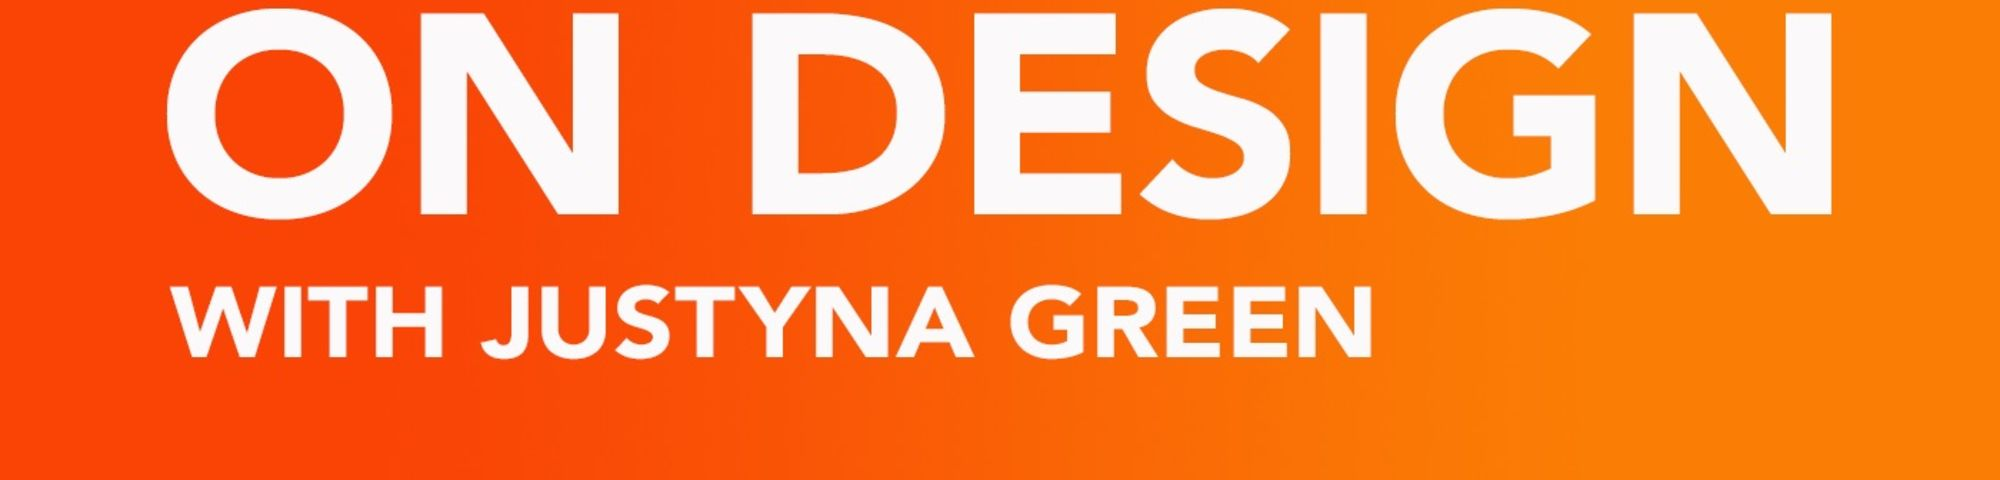 text over orange background